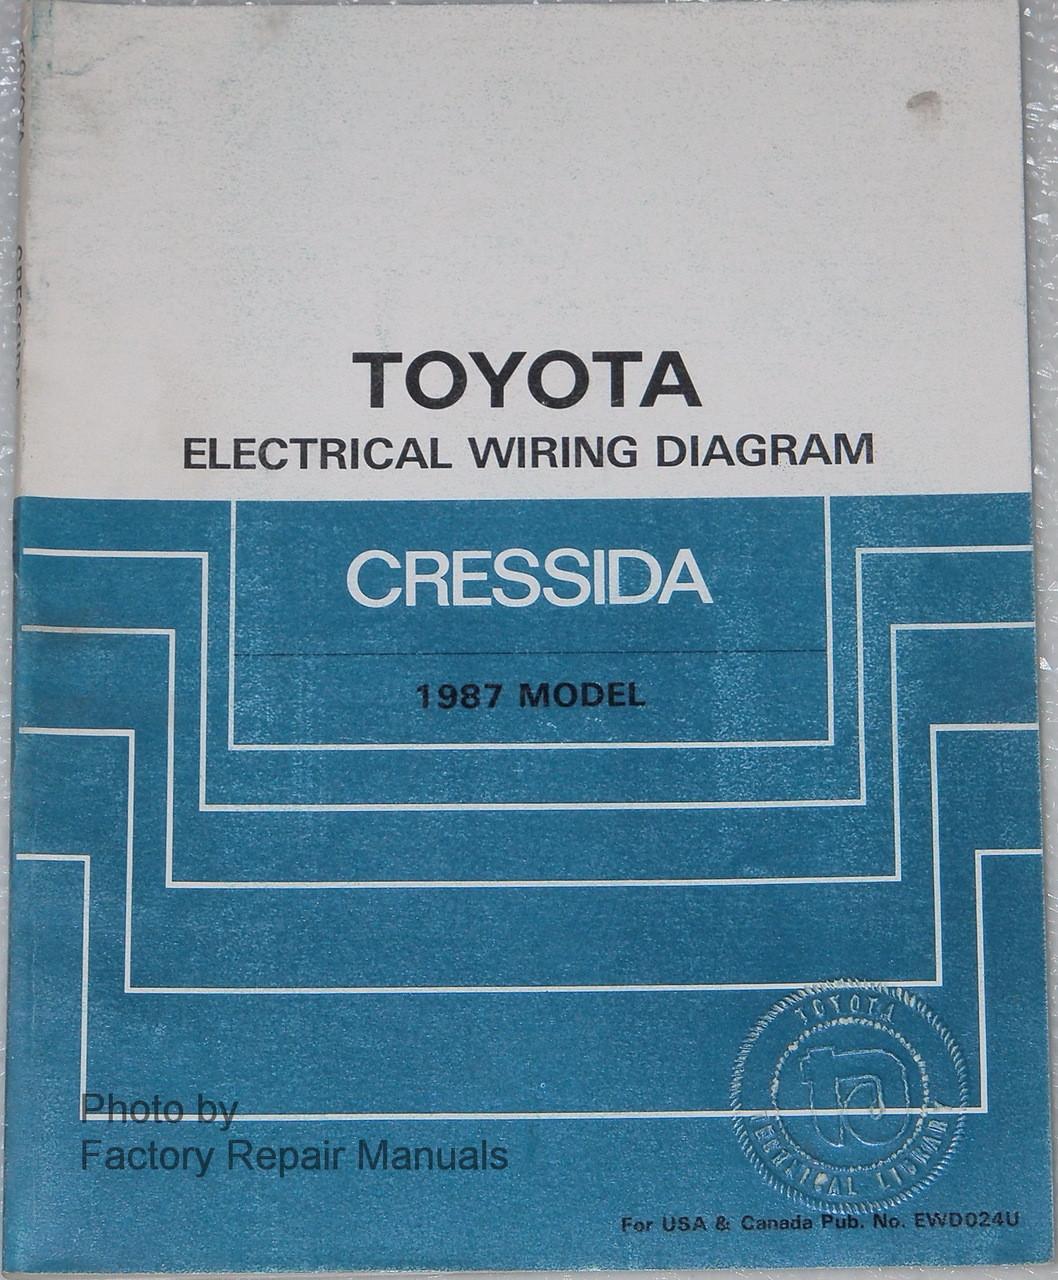 1987 Toyota Cressida Electrical Wiring Diagrams Original